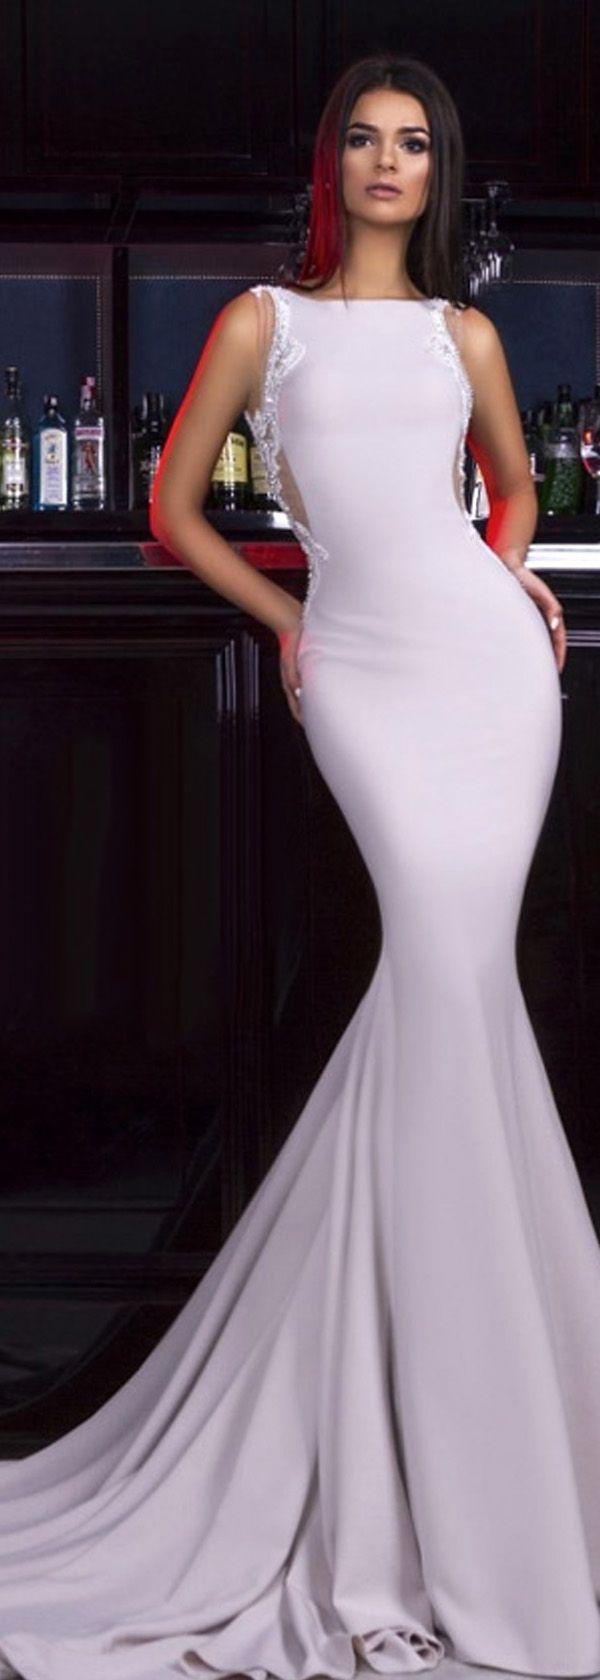 33 best Dresses images on Pinterest | Prom dresses, Evening gowns ...